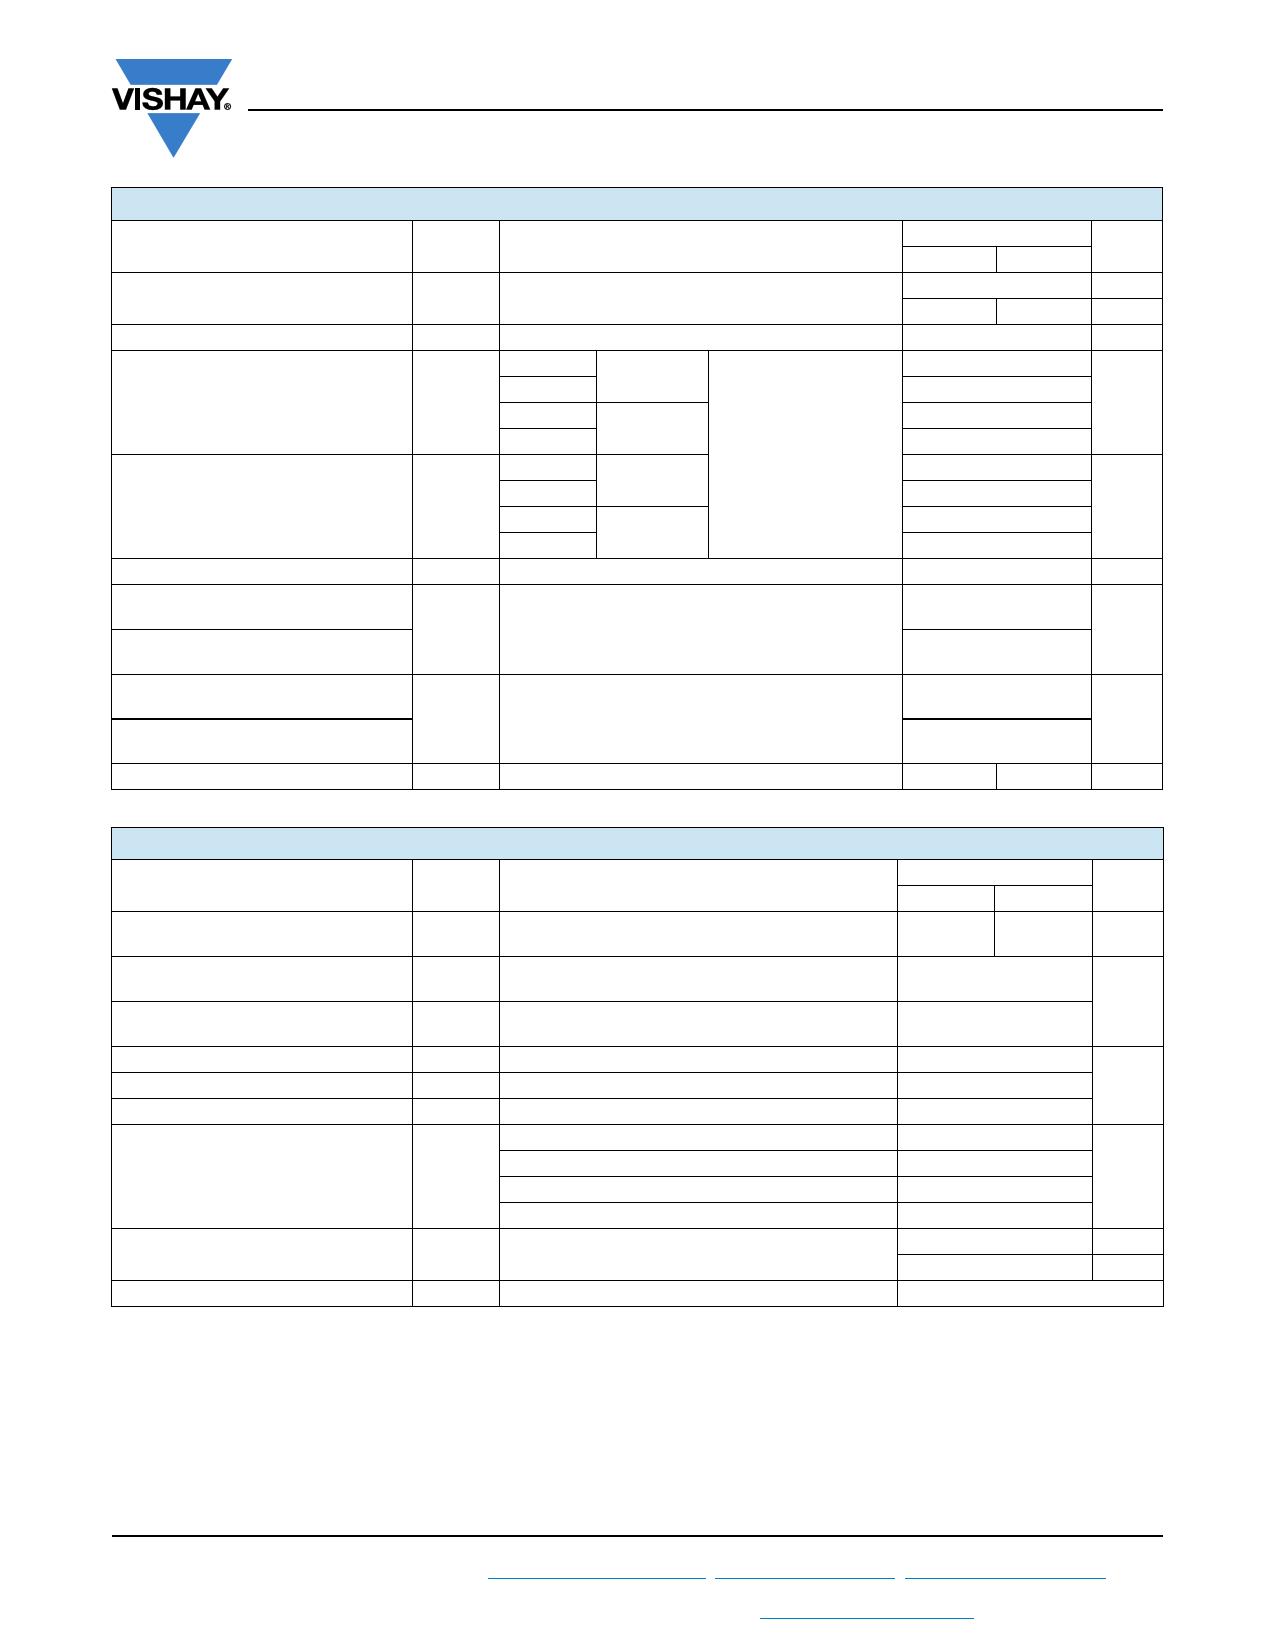 VS-88HFR140 pdf, equivalent, schematic